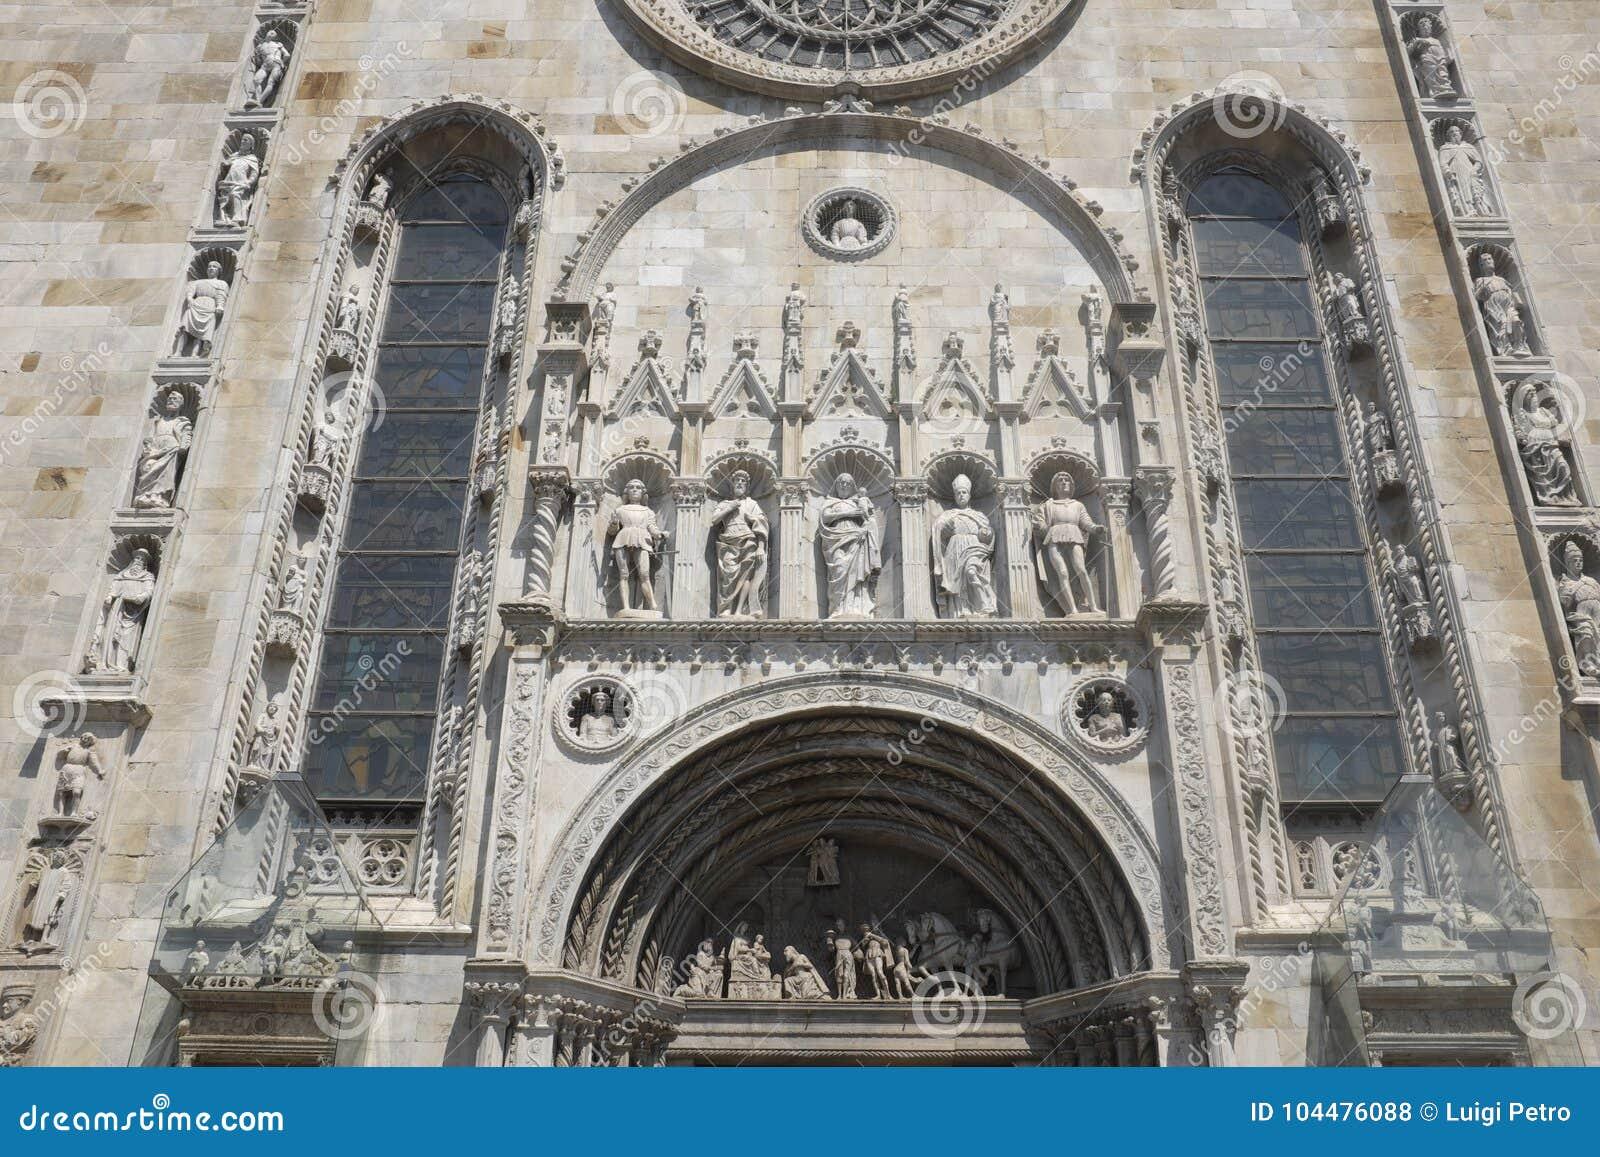 Como, dettagli del Cathderal Santa Maria Assunta